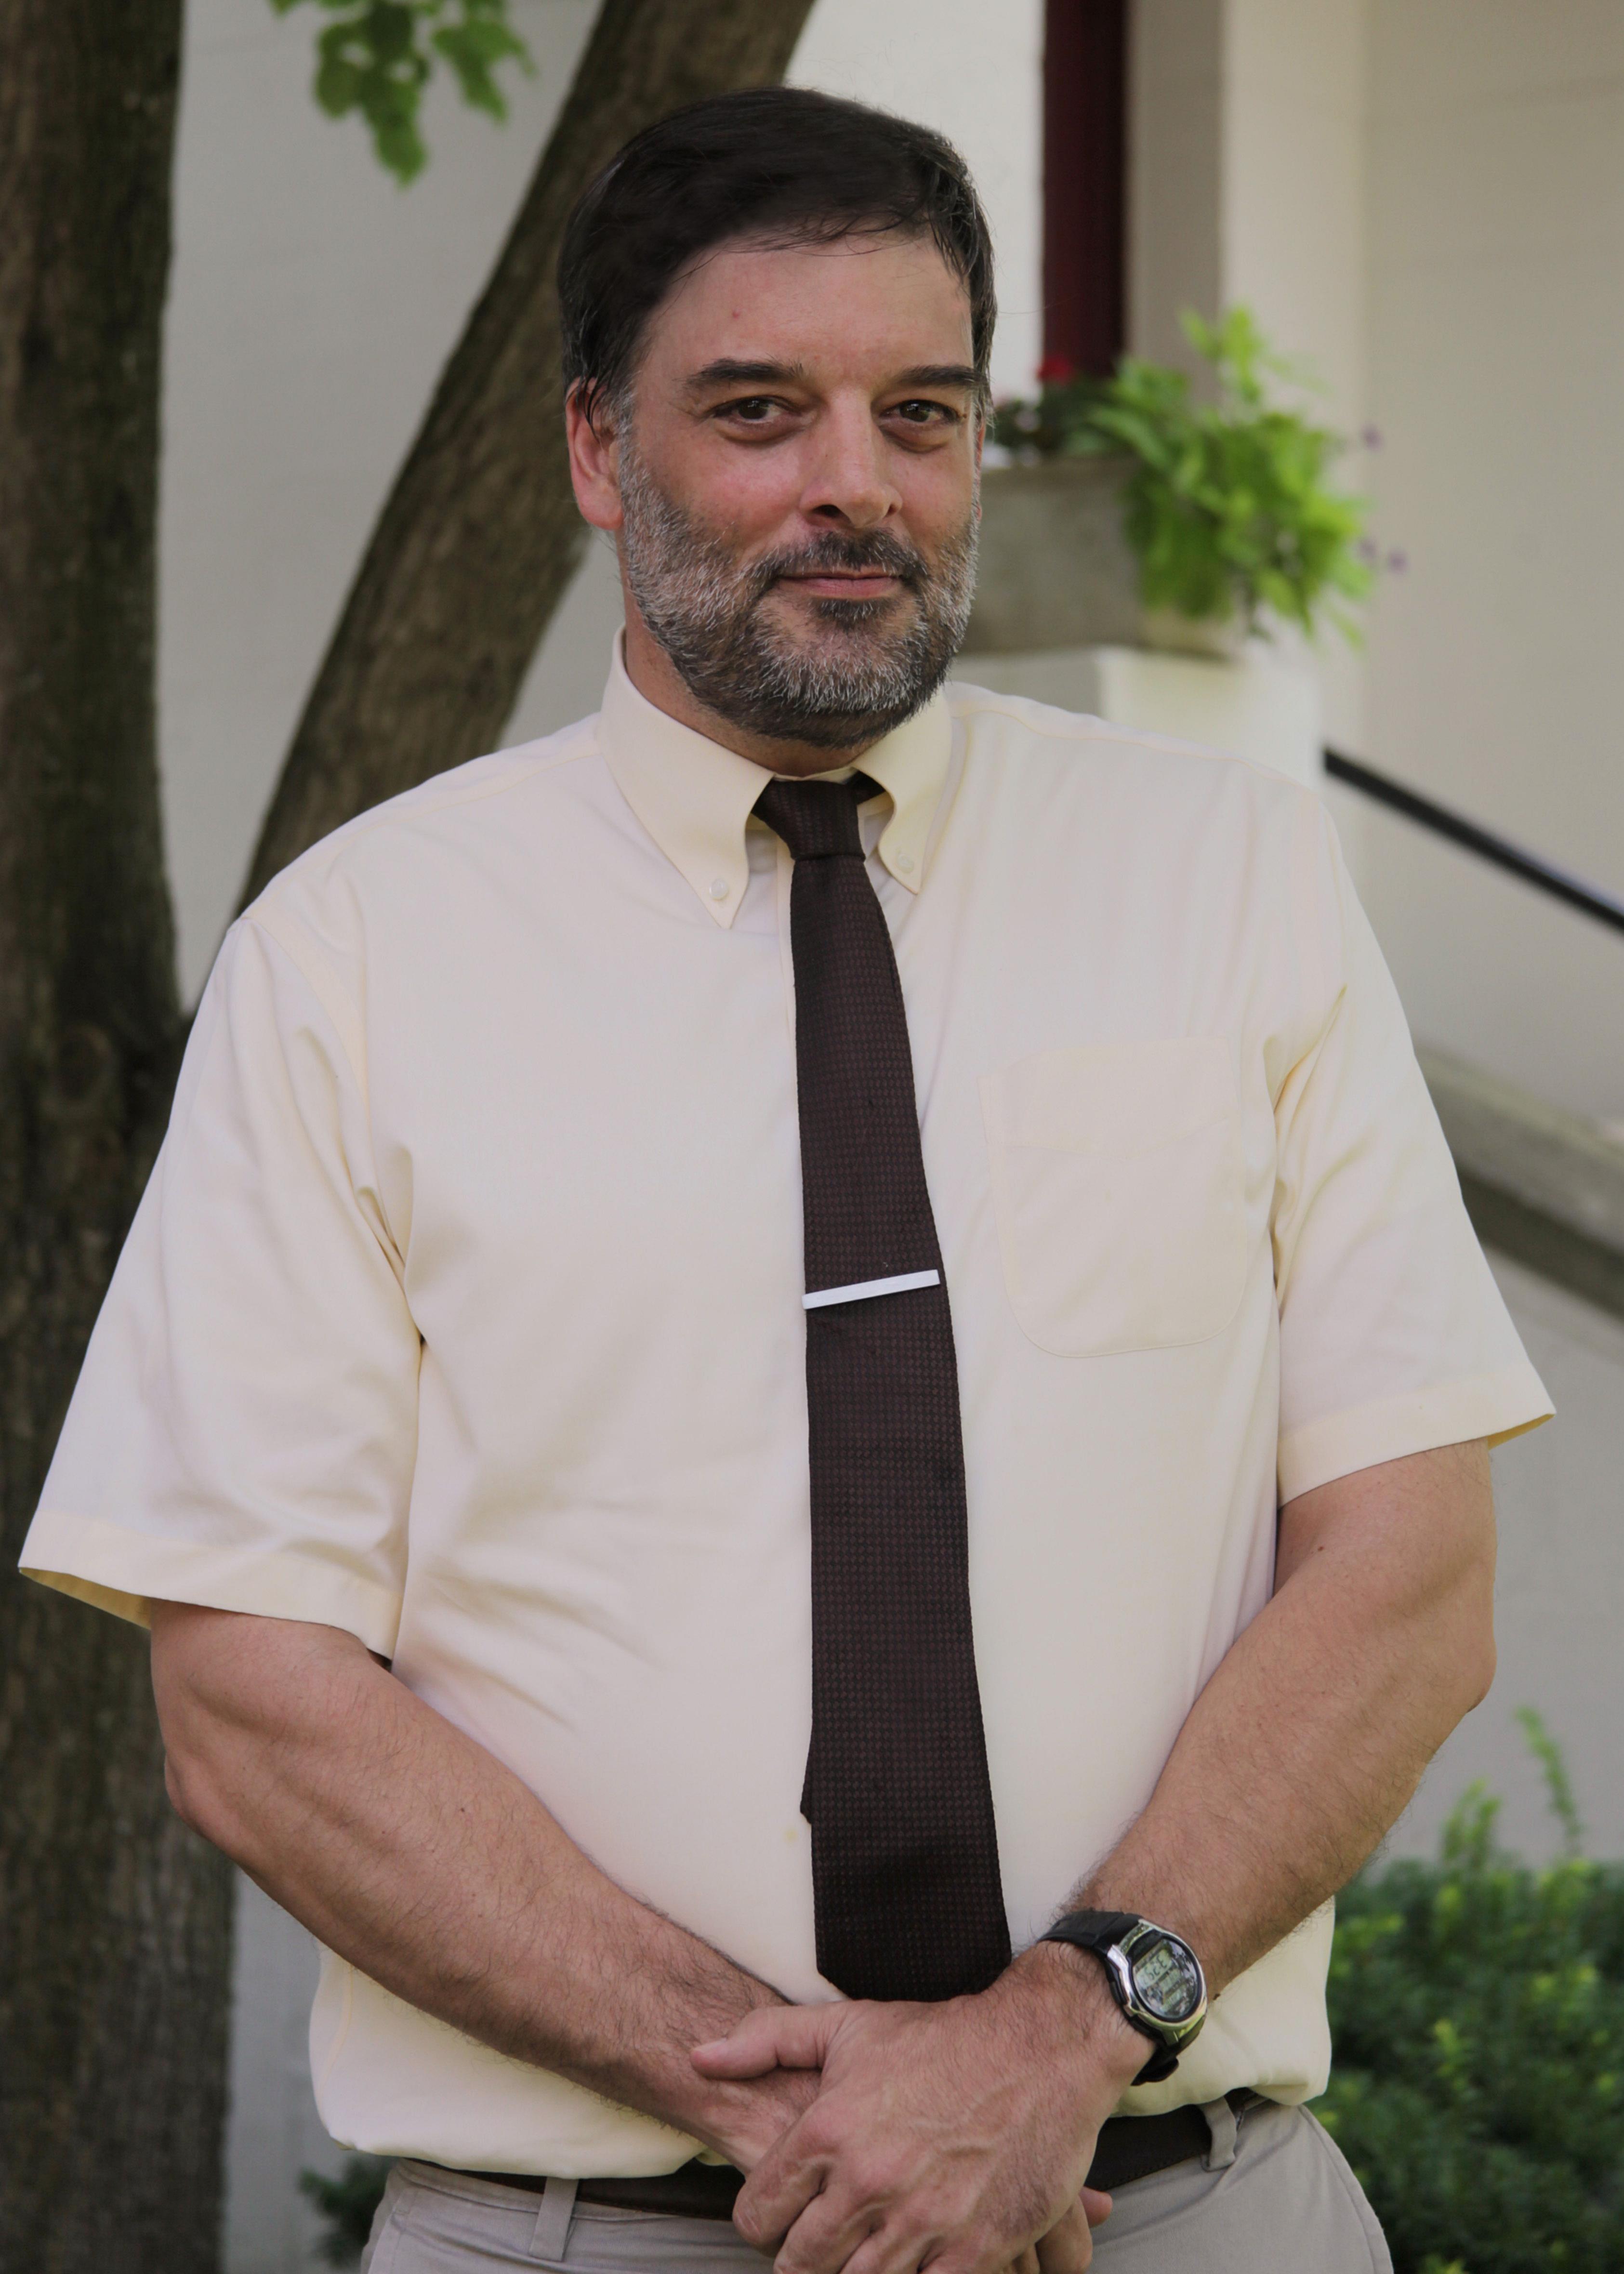 1st Presbyterian Church Ionia - Dr. Chris Dorn